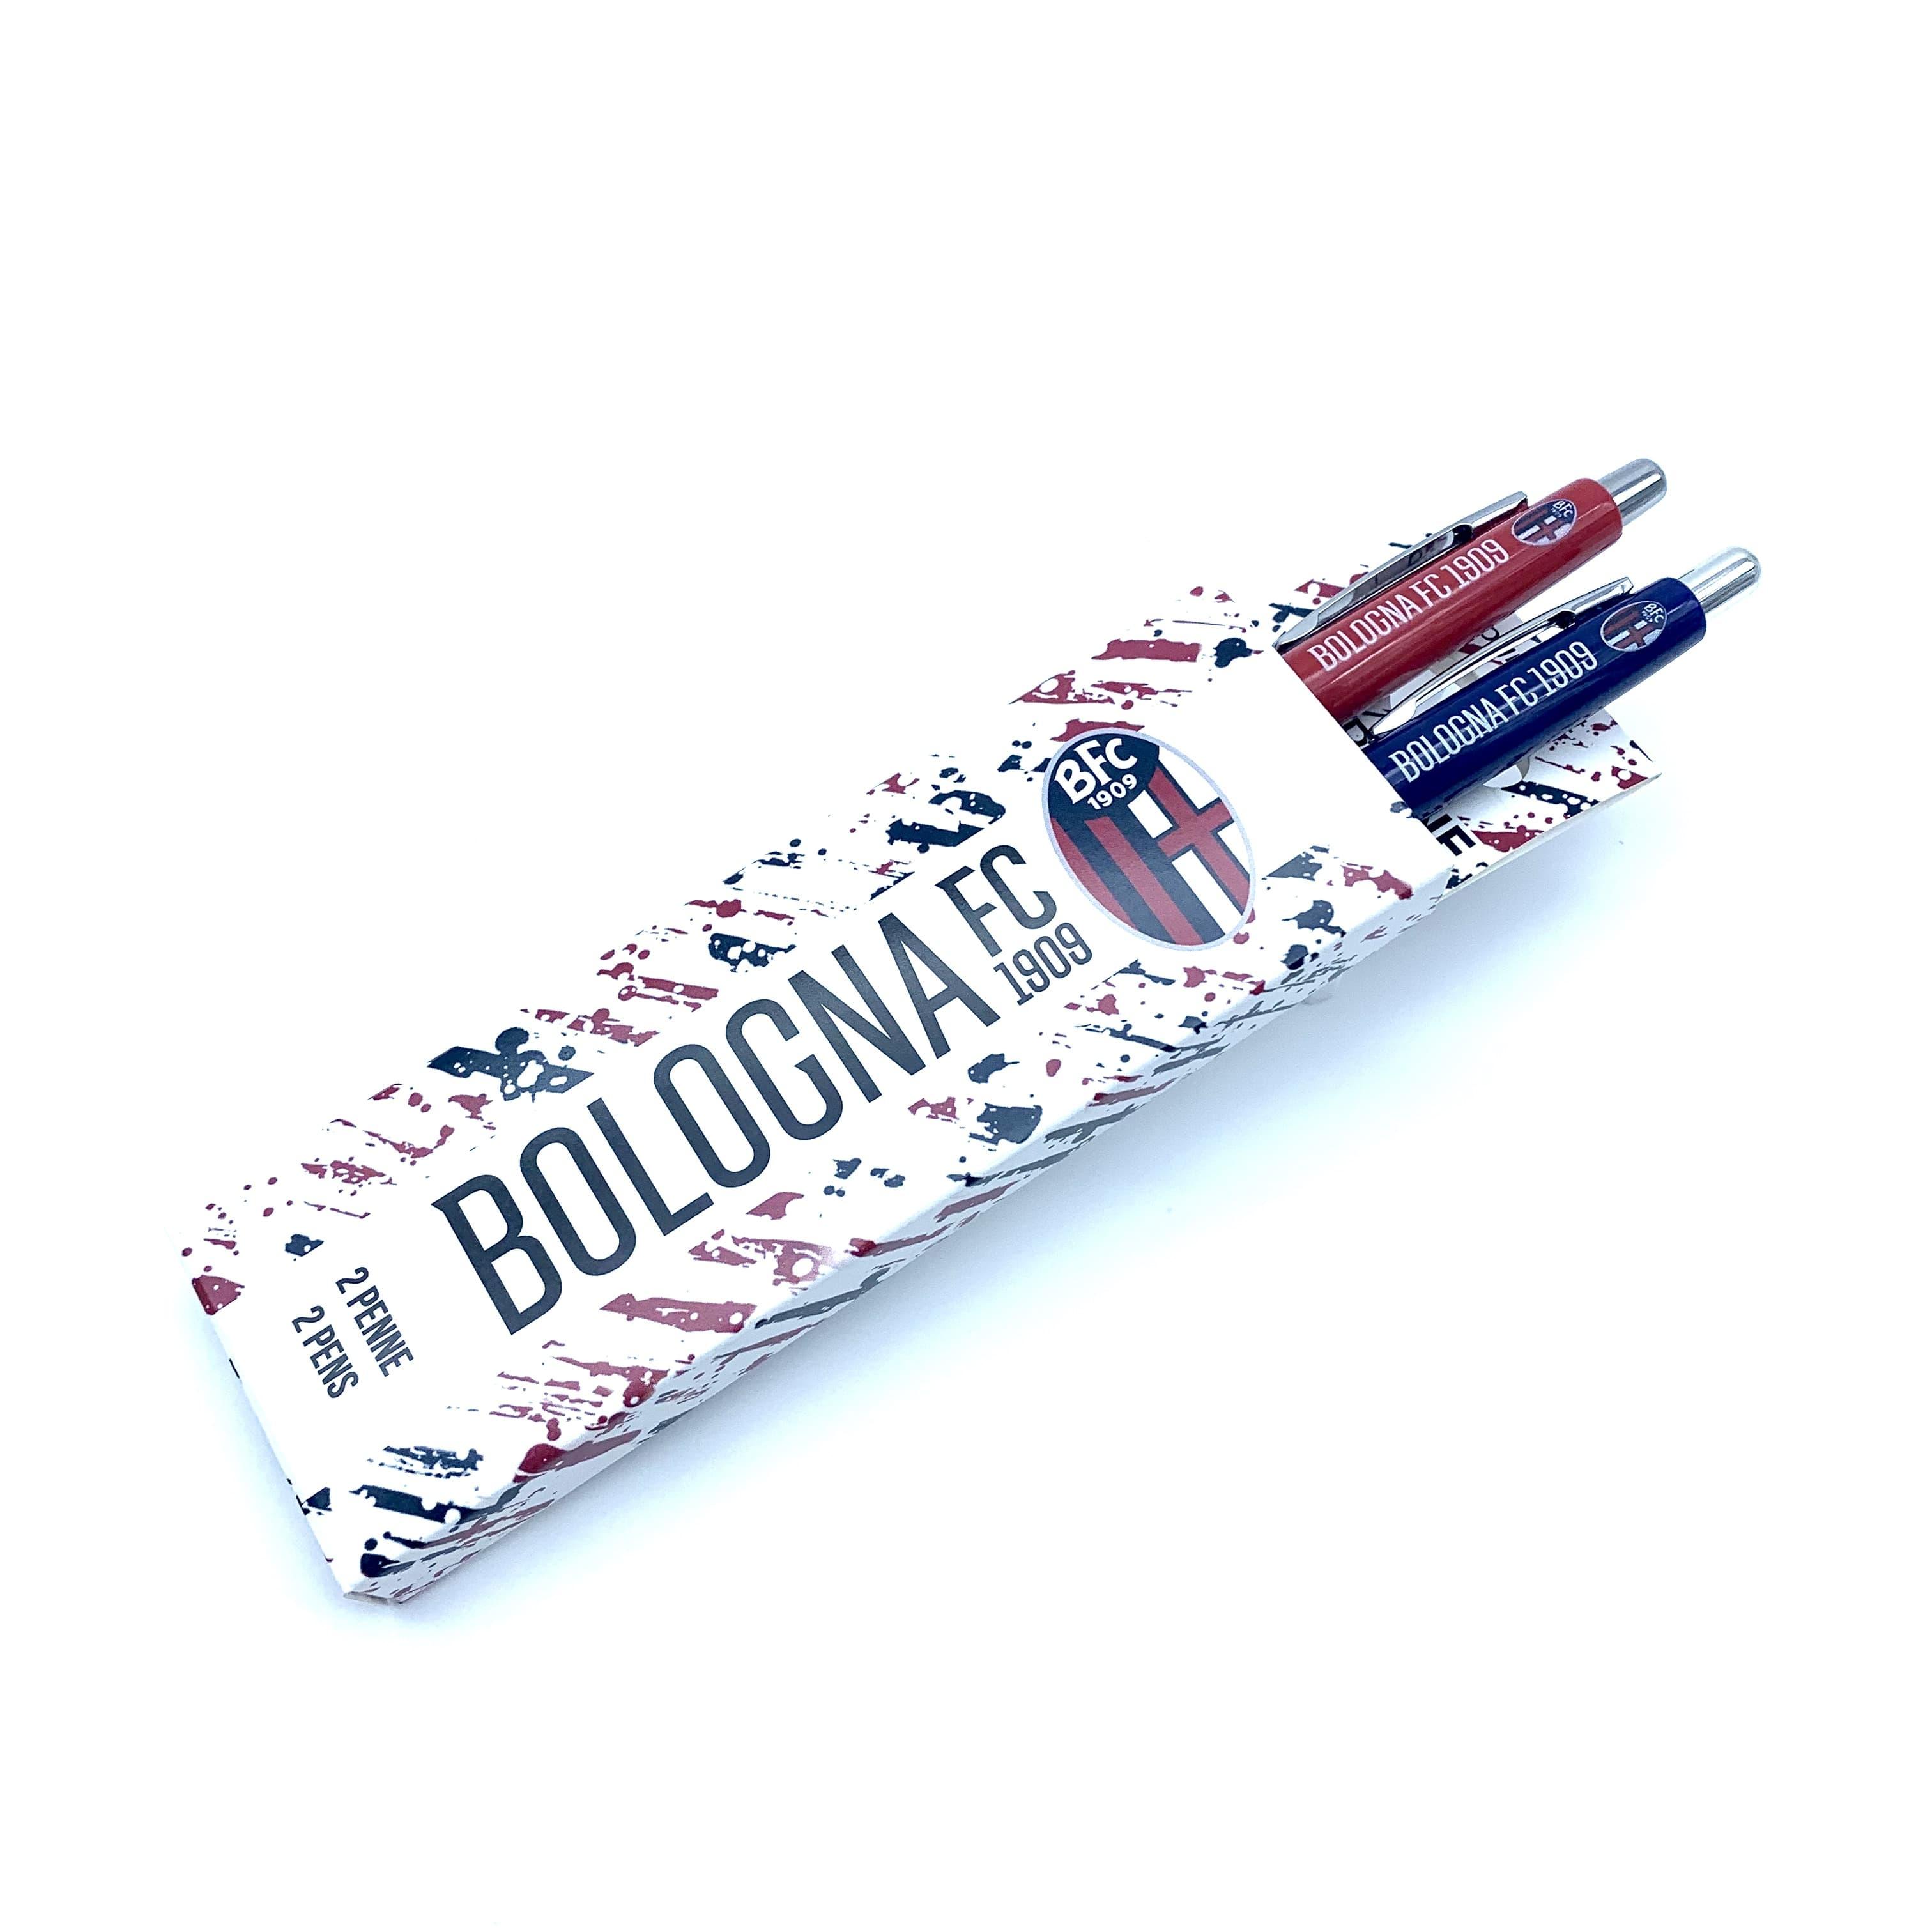 Bologna Fc KIT PENNE